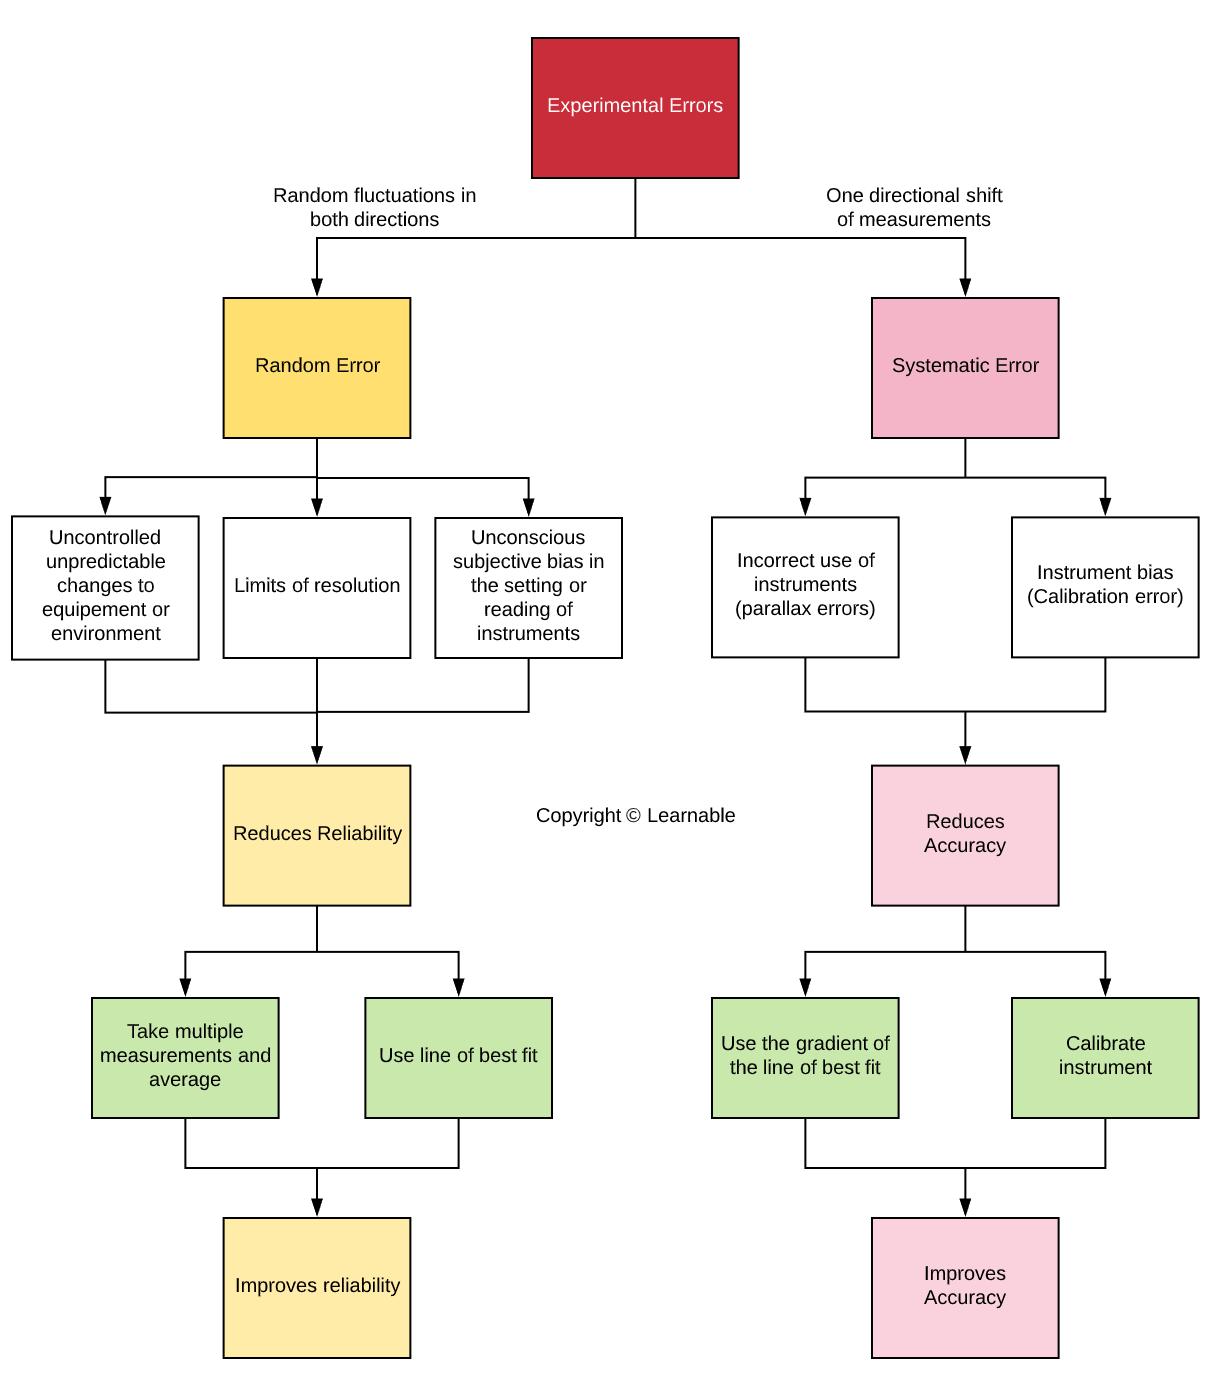 Data Analysis Task Experimental Errors Flowchart